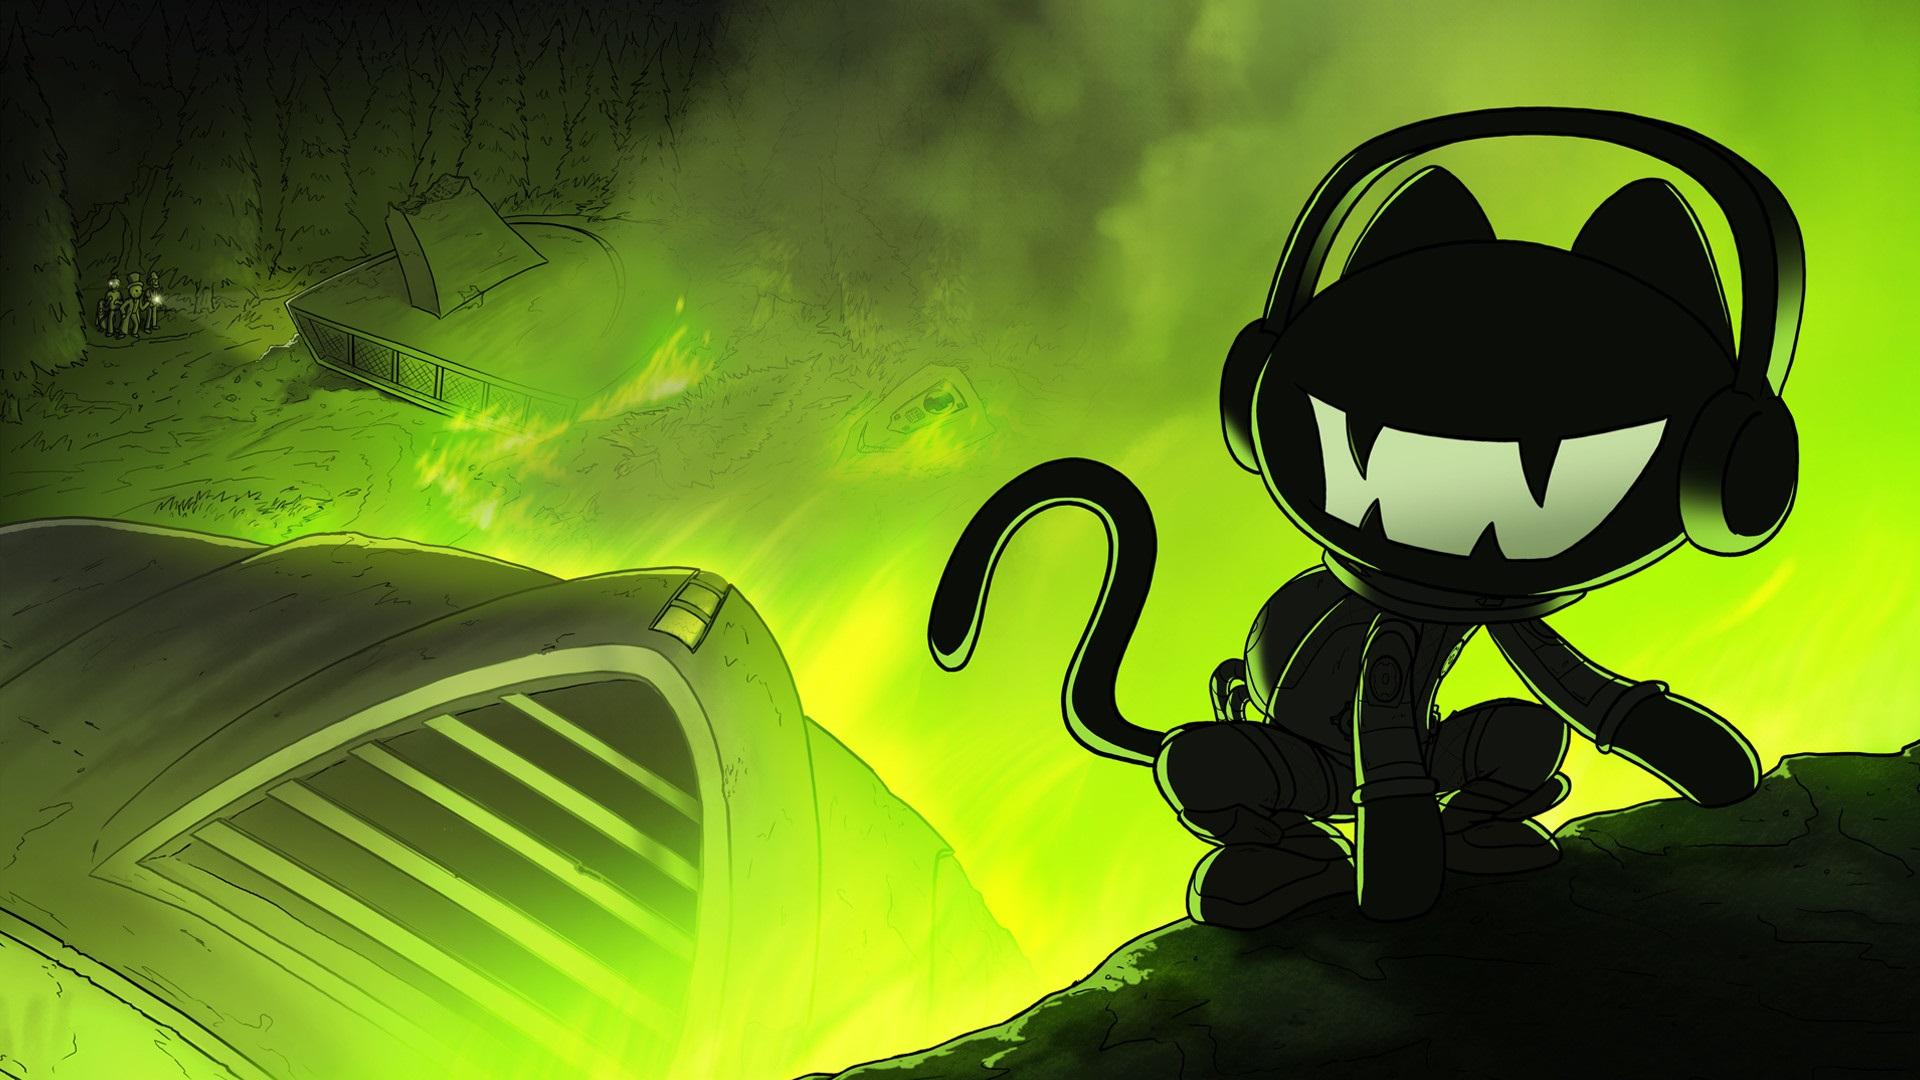 Music Monstercat 1920x1080